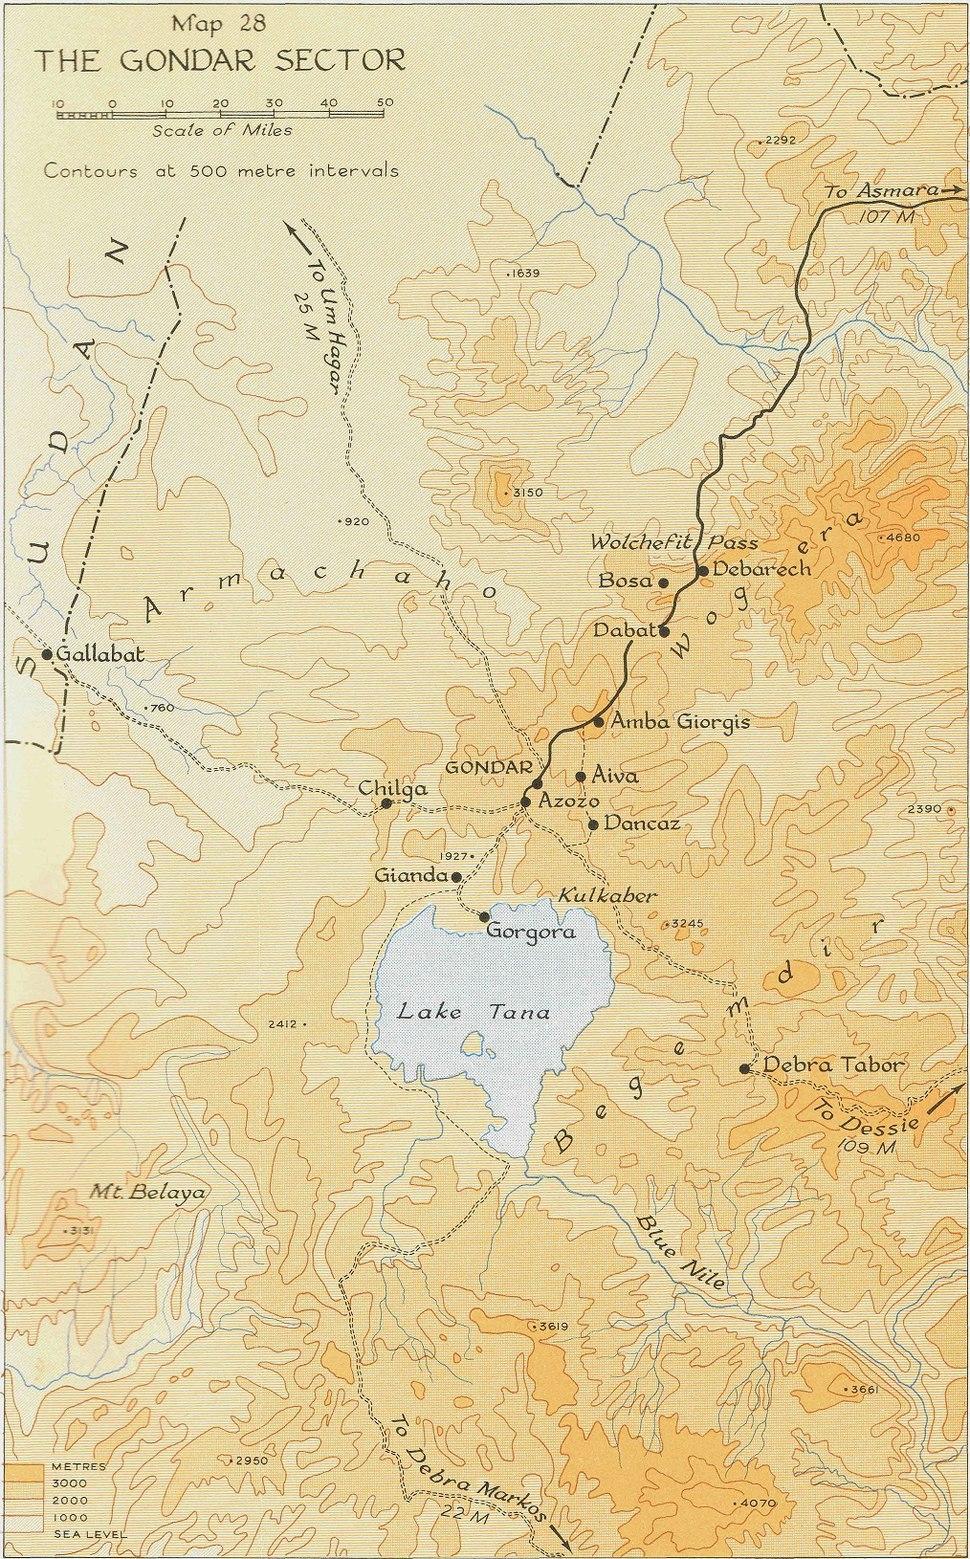 Gondar sector, East African Campaign